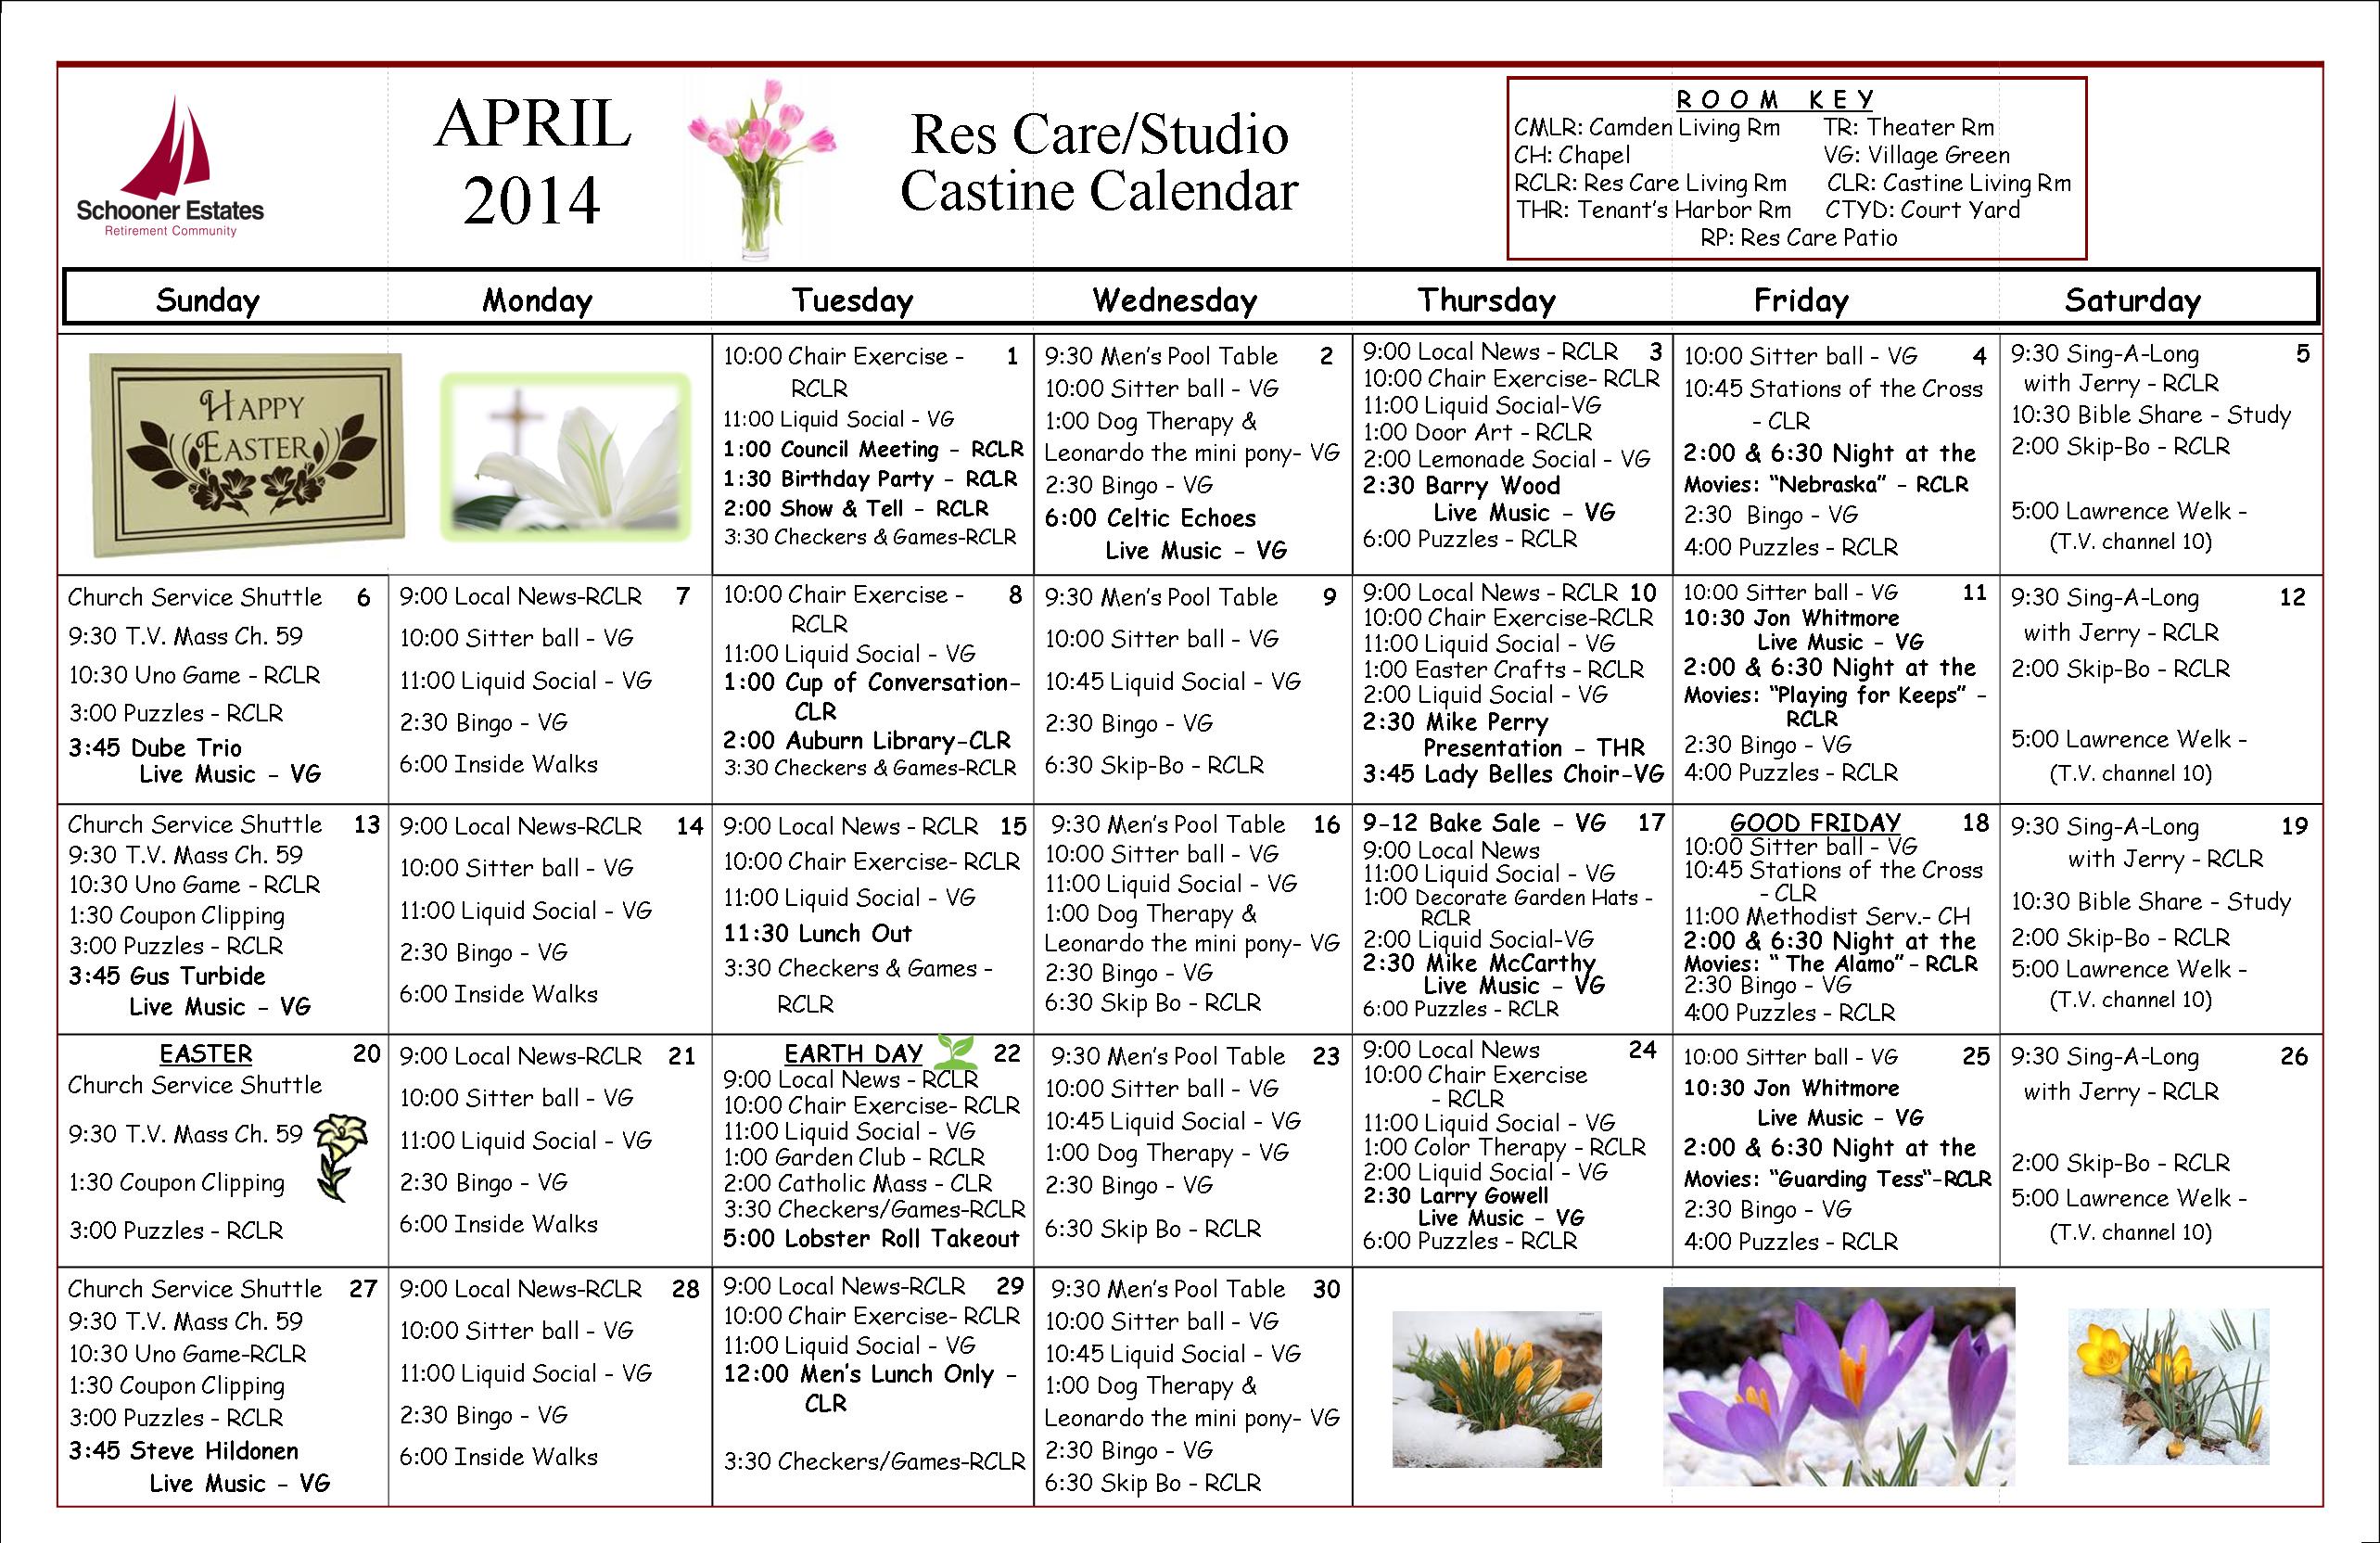 Res Care April Calendar  2014